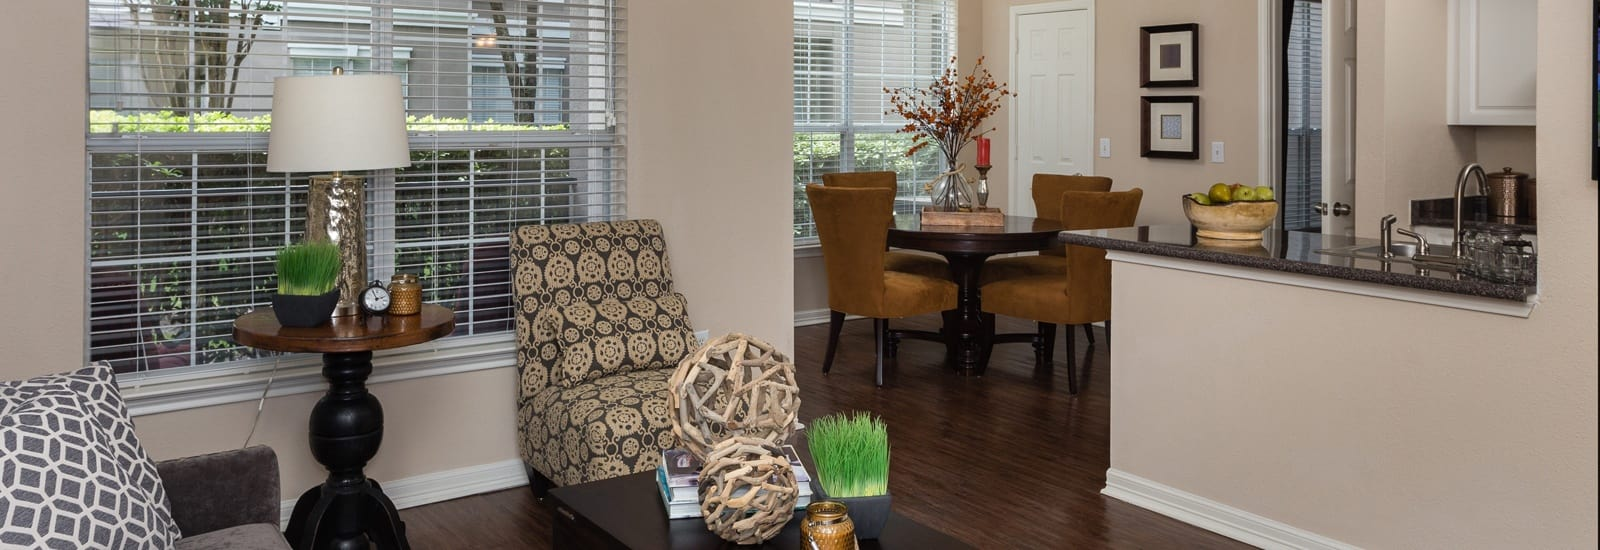 Apartments in Houston TX